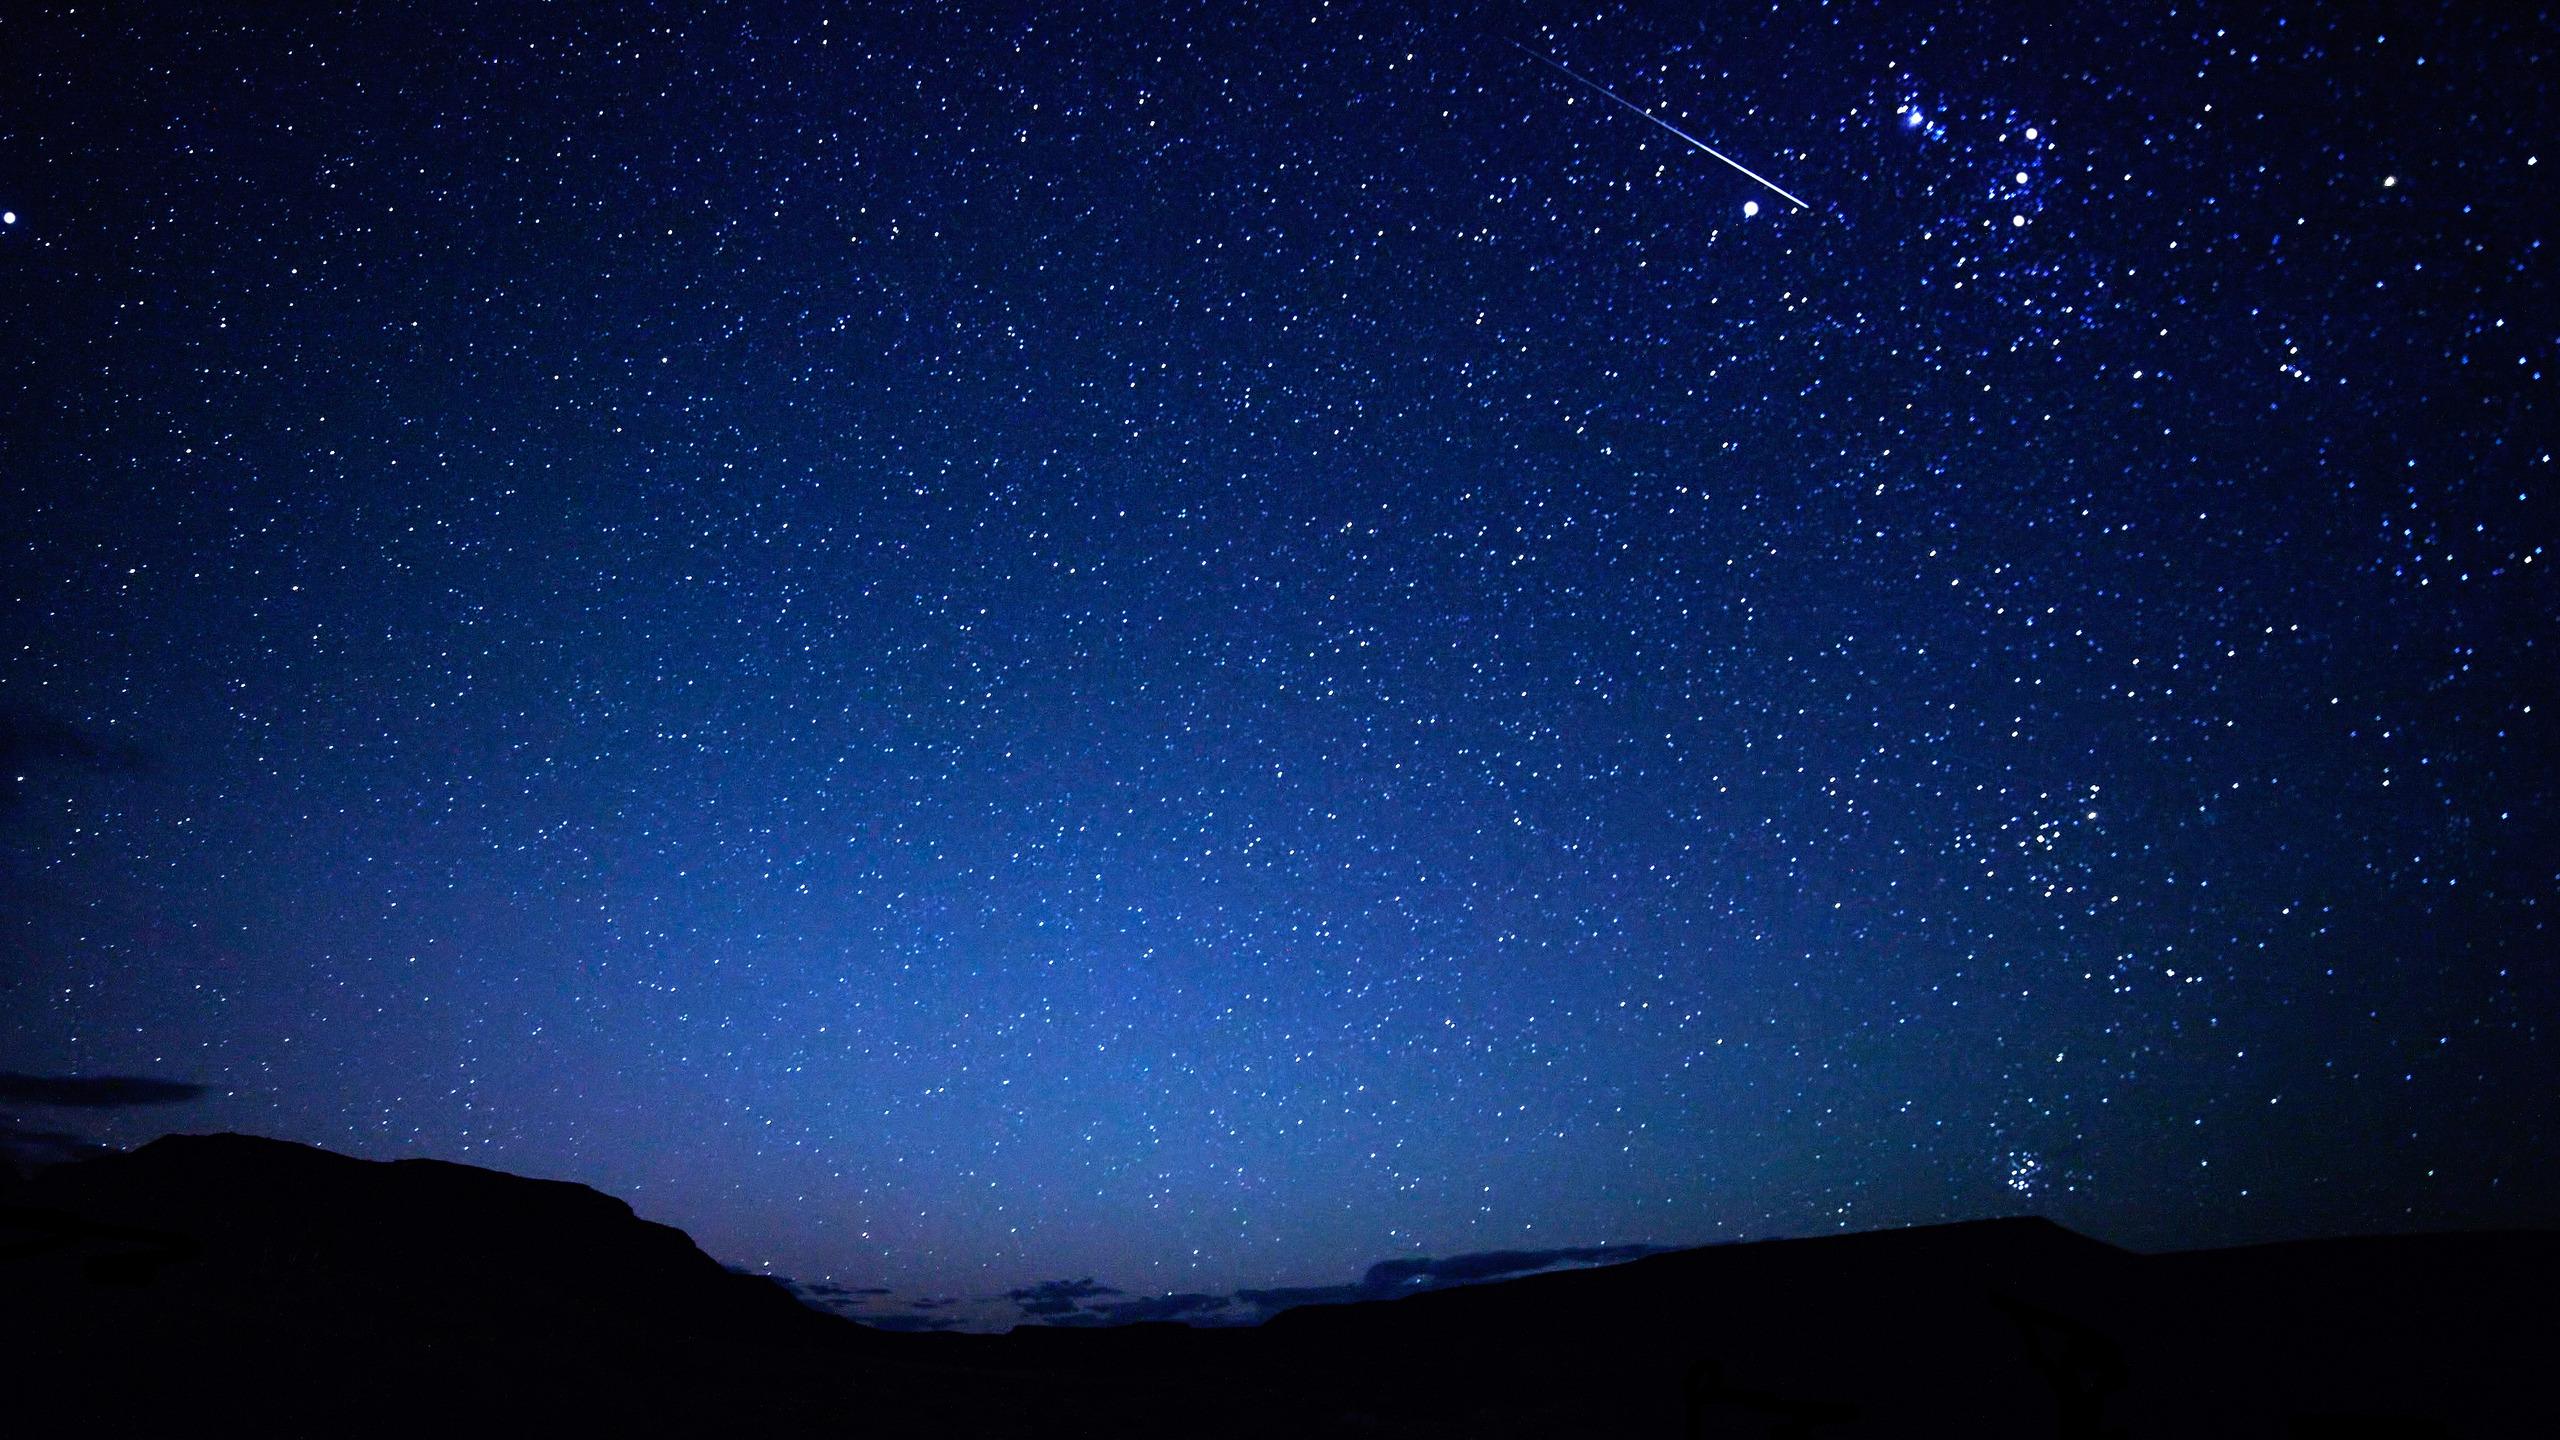 Звездное небо картинки, открытки